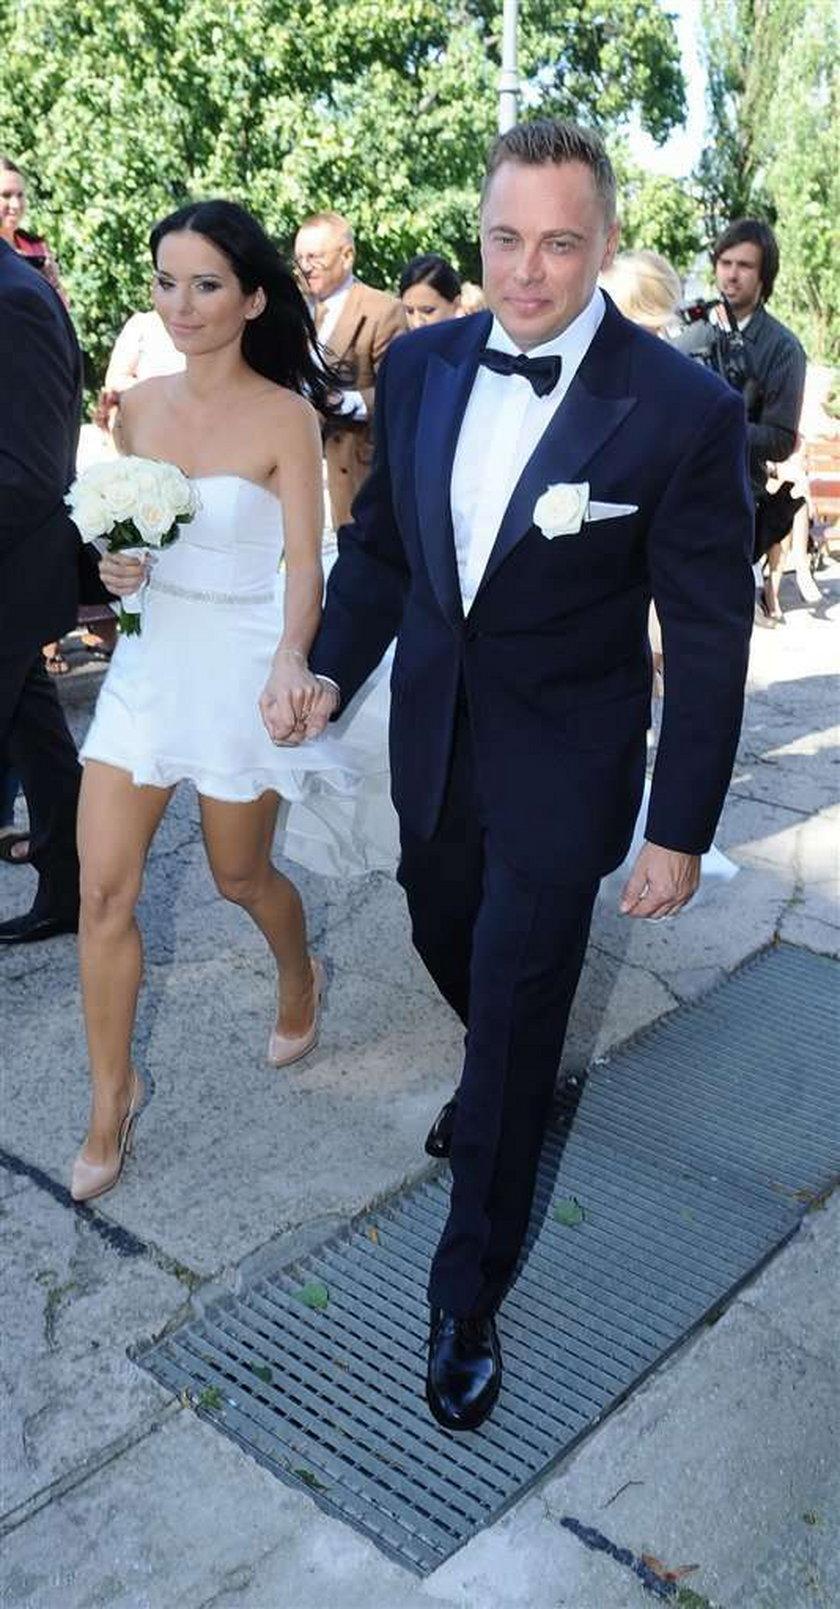 Ślub Pauliny Sykut